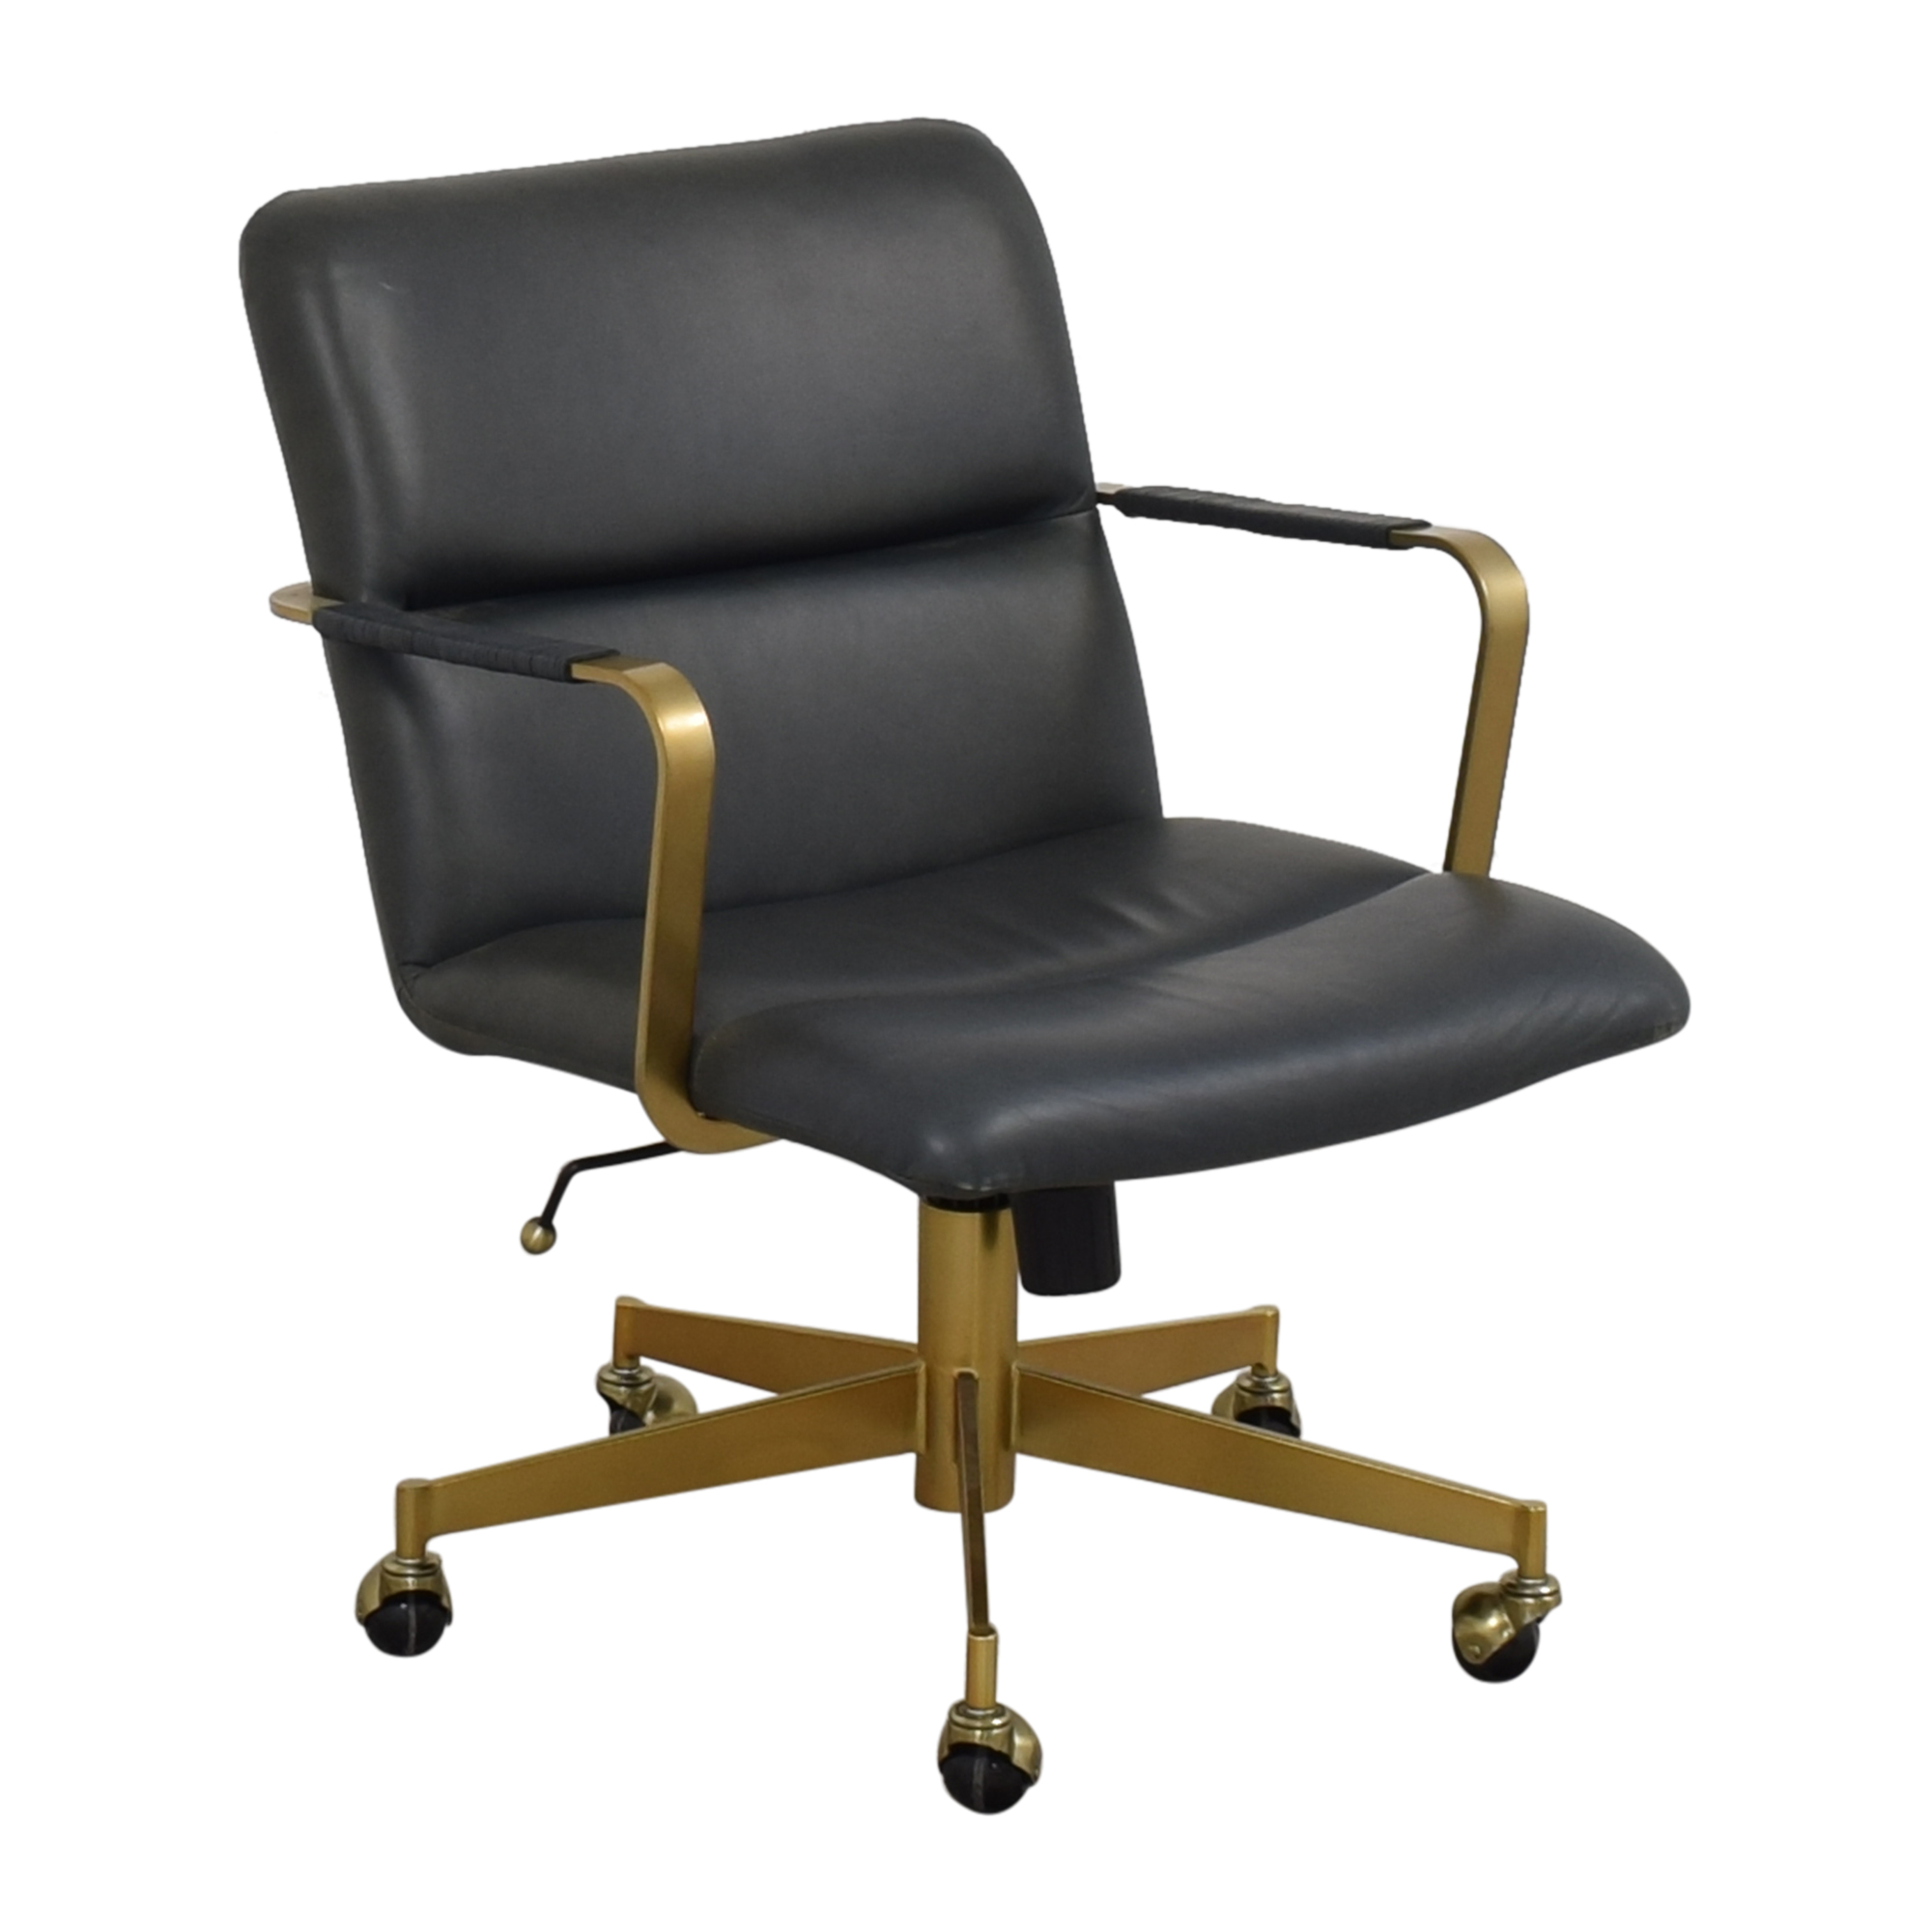 West Elm West Elm Cooper Mid-Century Swivel Office Chair nyc